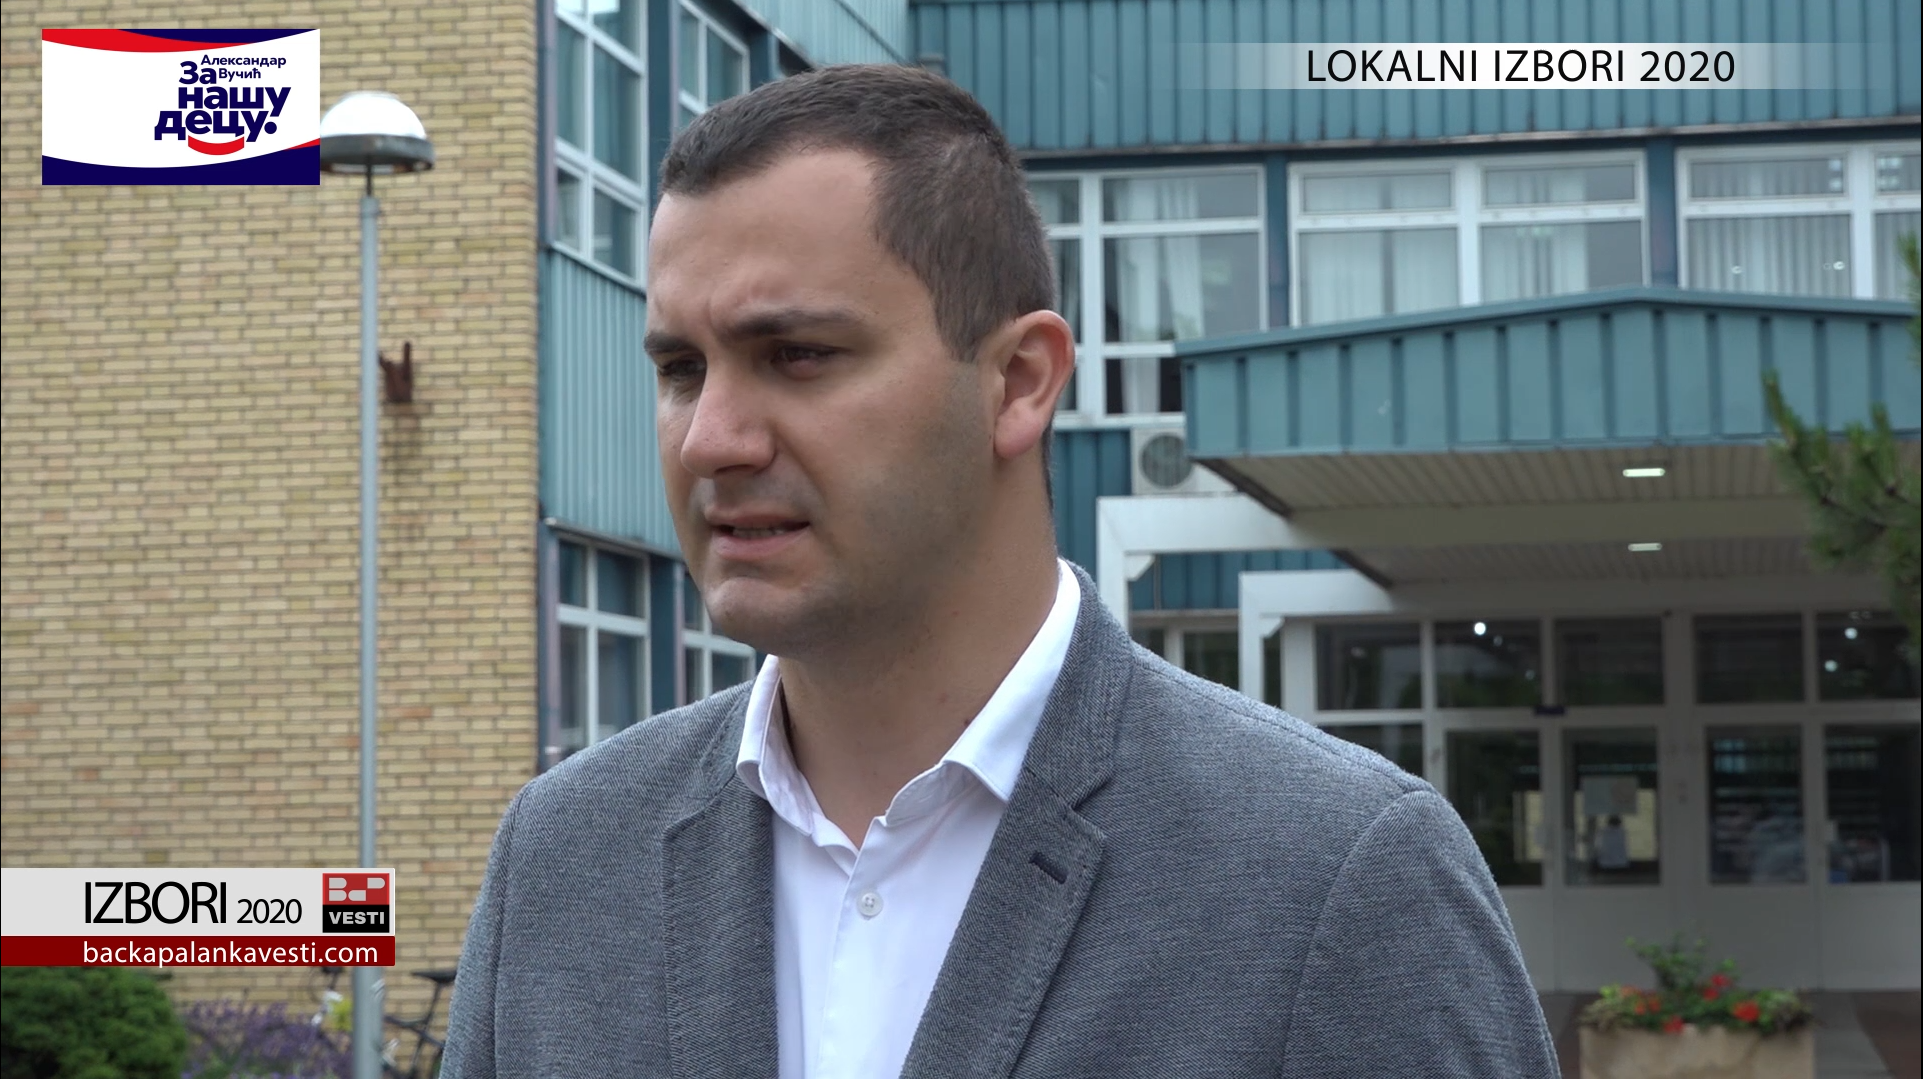 Intervju: Srđan Simić, predsednik opštine Bački Petrovac (VIDEO)